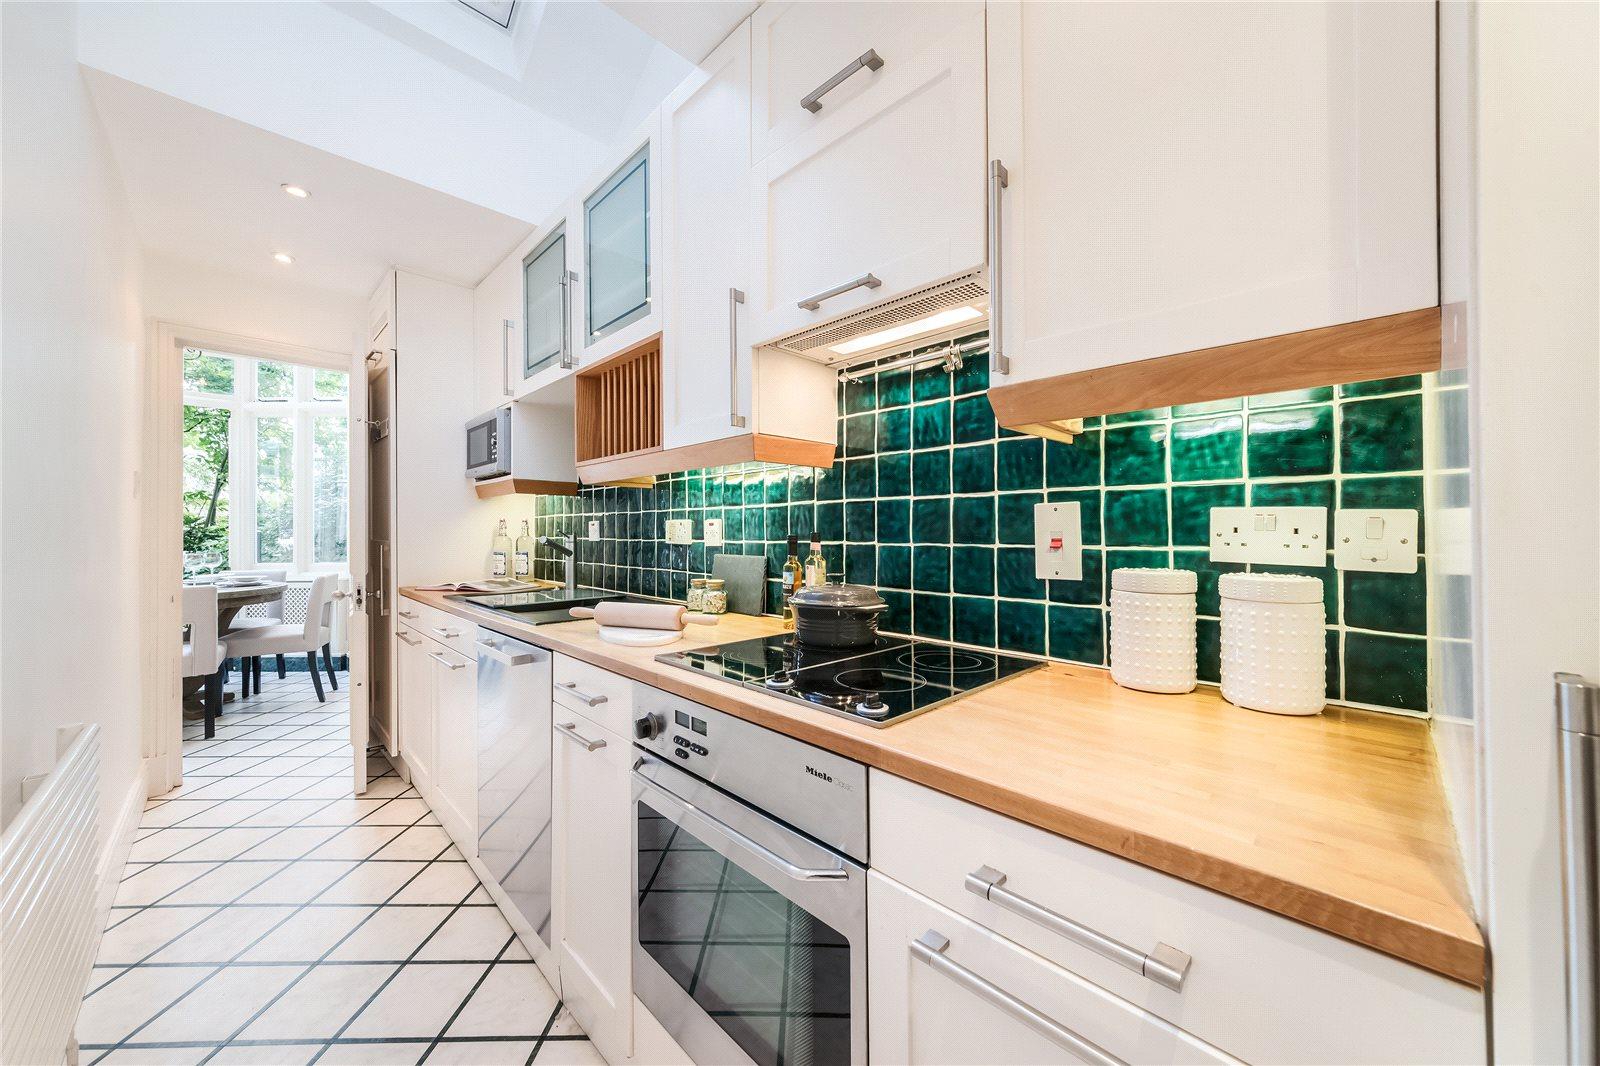 Additional photo for property listing at Cranley Gardens, South Kensington, London, SW7 South Kensington, London, Engeland